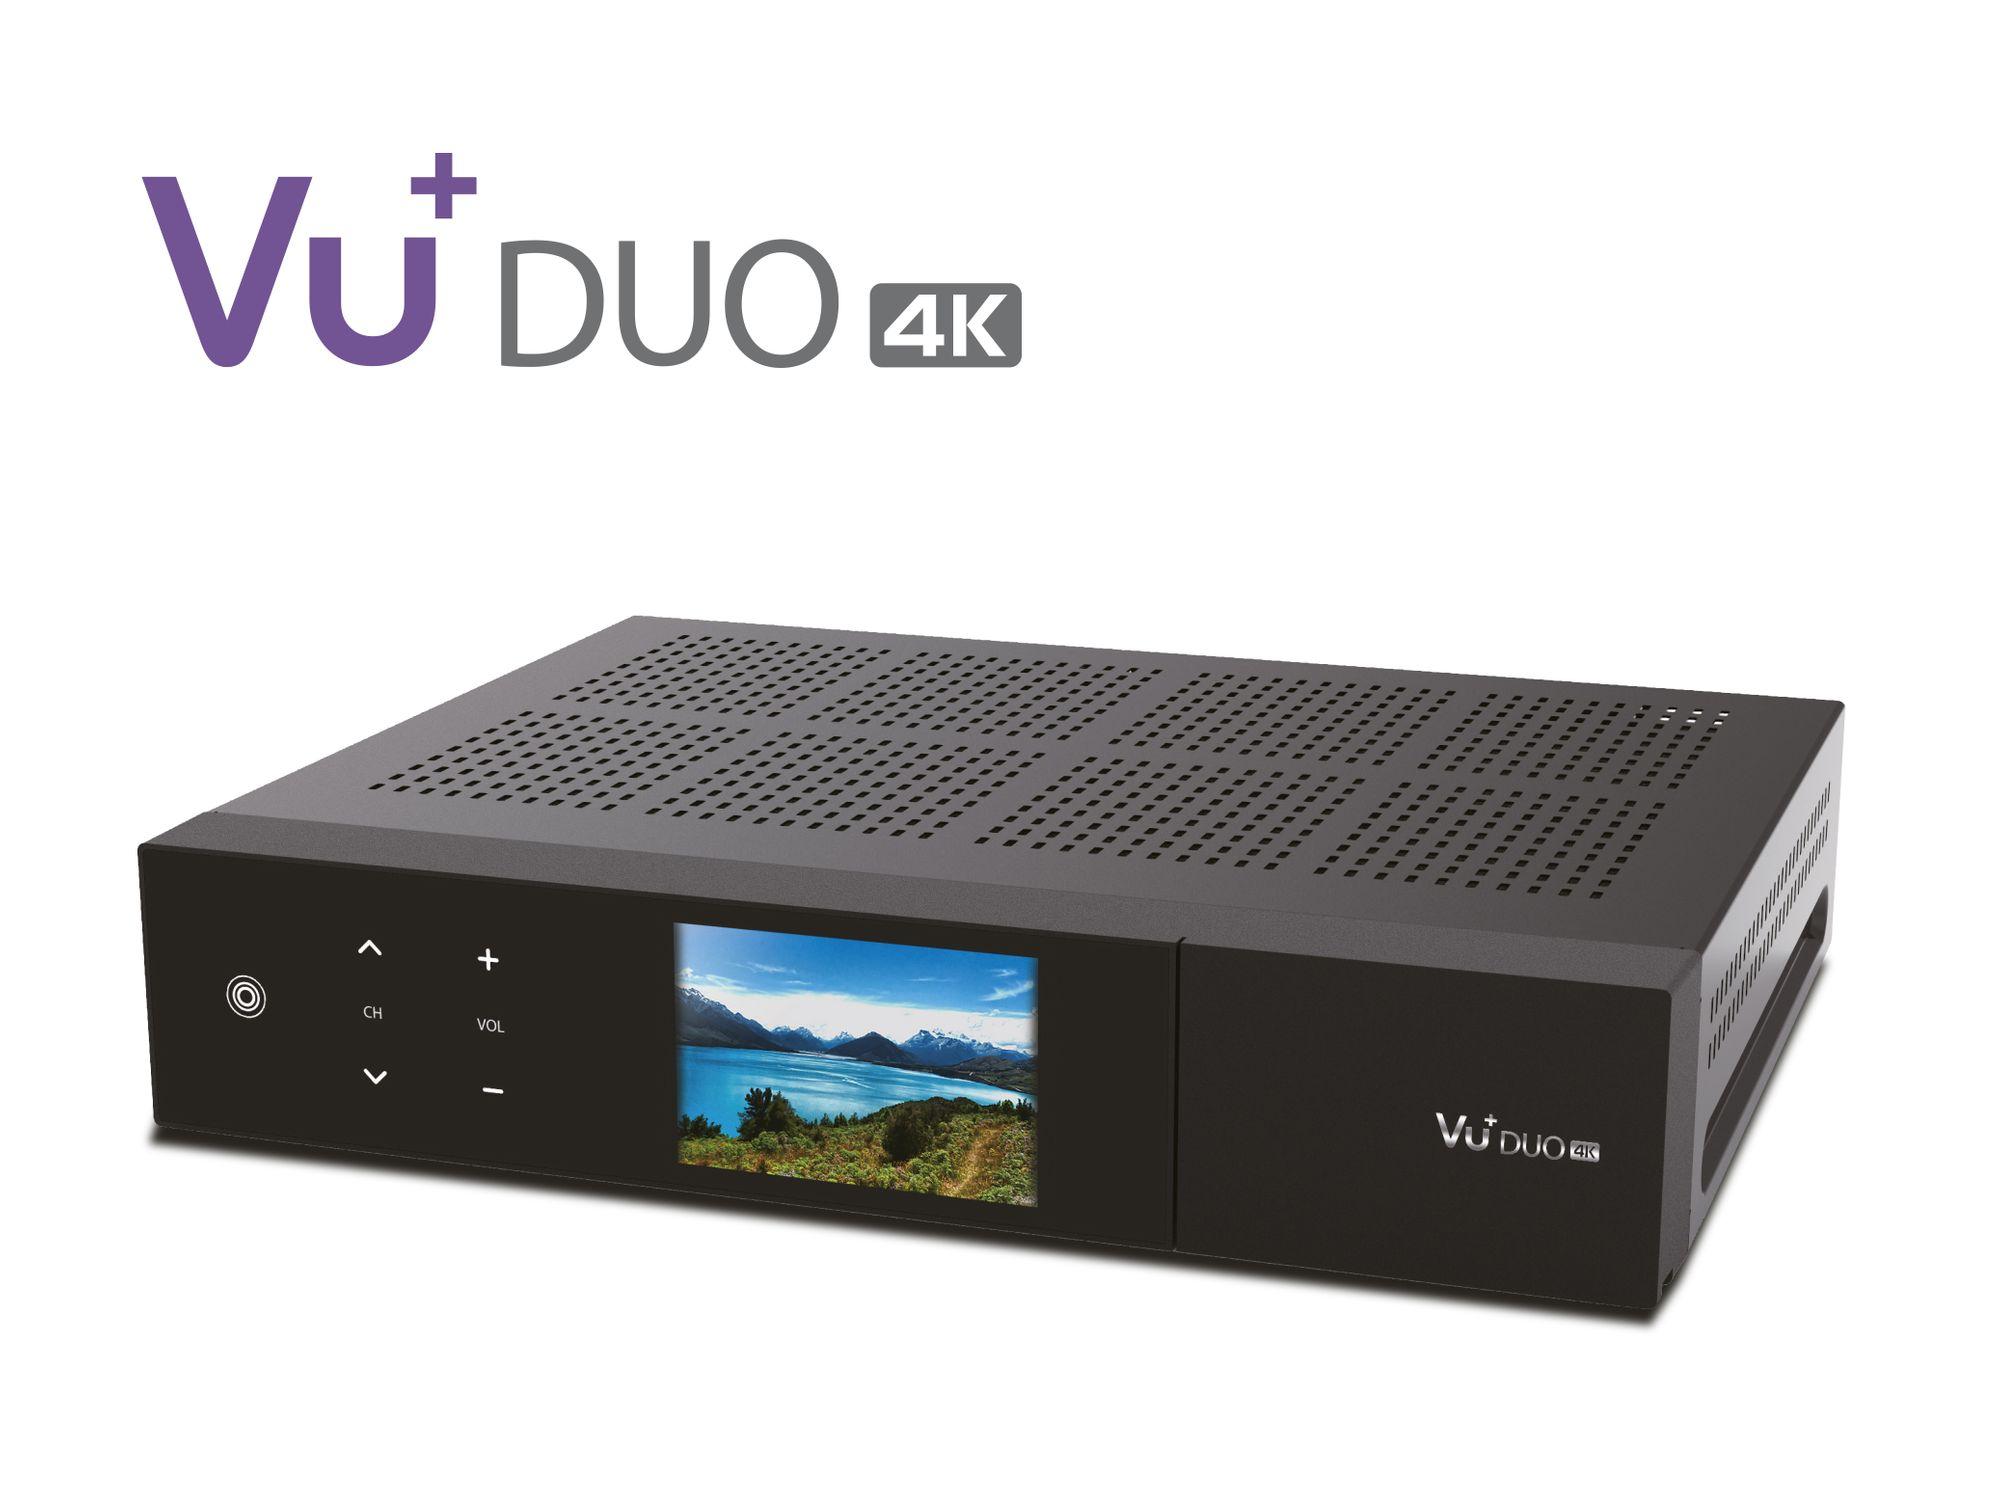 VU+ Duo 4K 1x DVB-S2X FBC Twin Tuner PVR Linux Receiver UHD 1 TB Festplatte